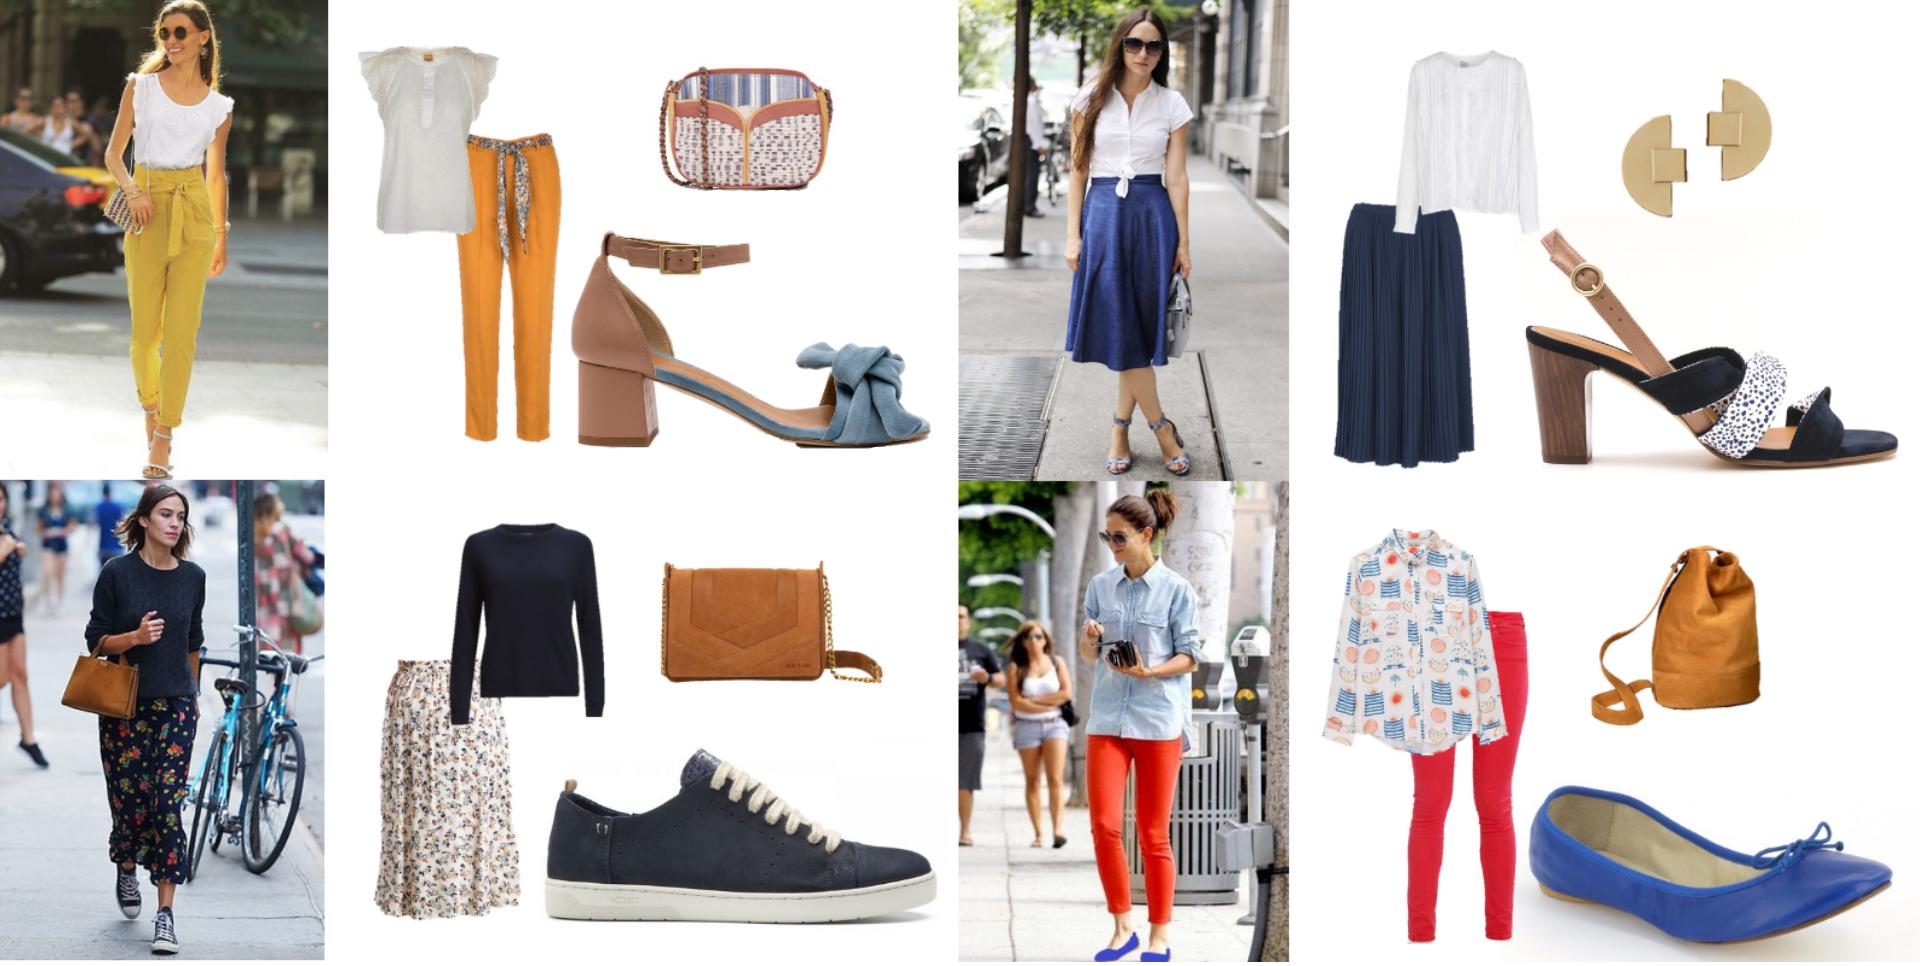 chaussures, tendance, couleur, bleu, shopping, styliste, printemps, mode, conseils